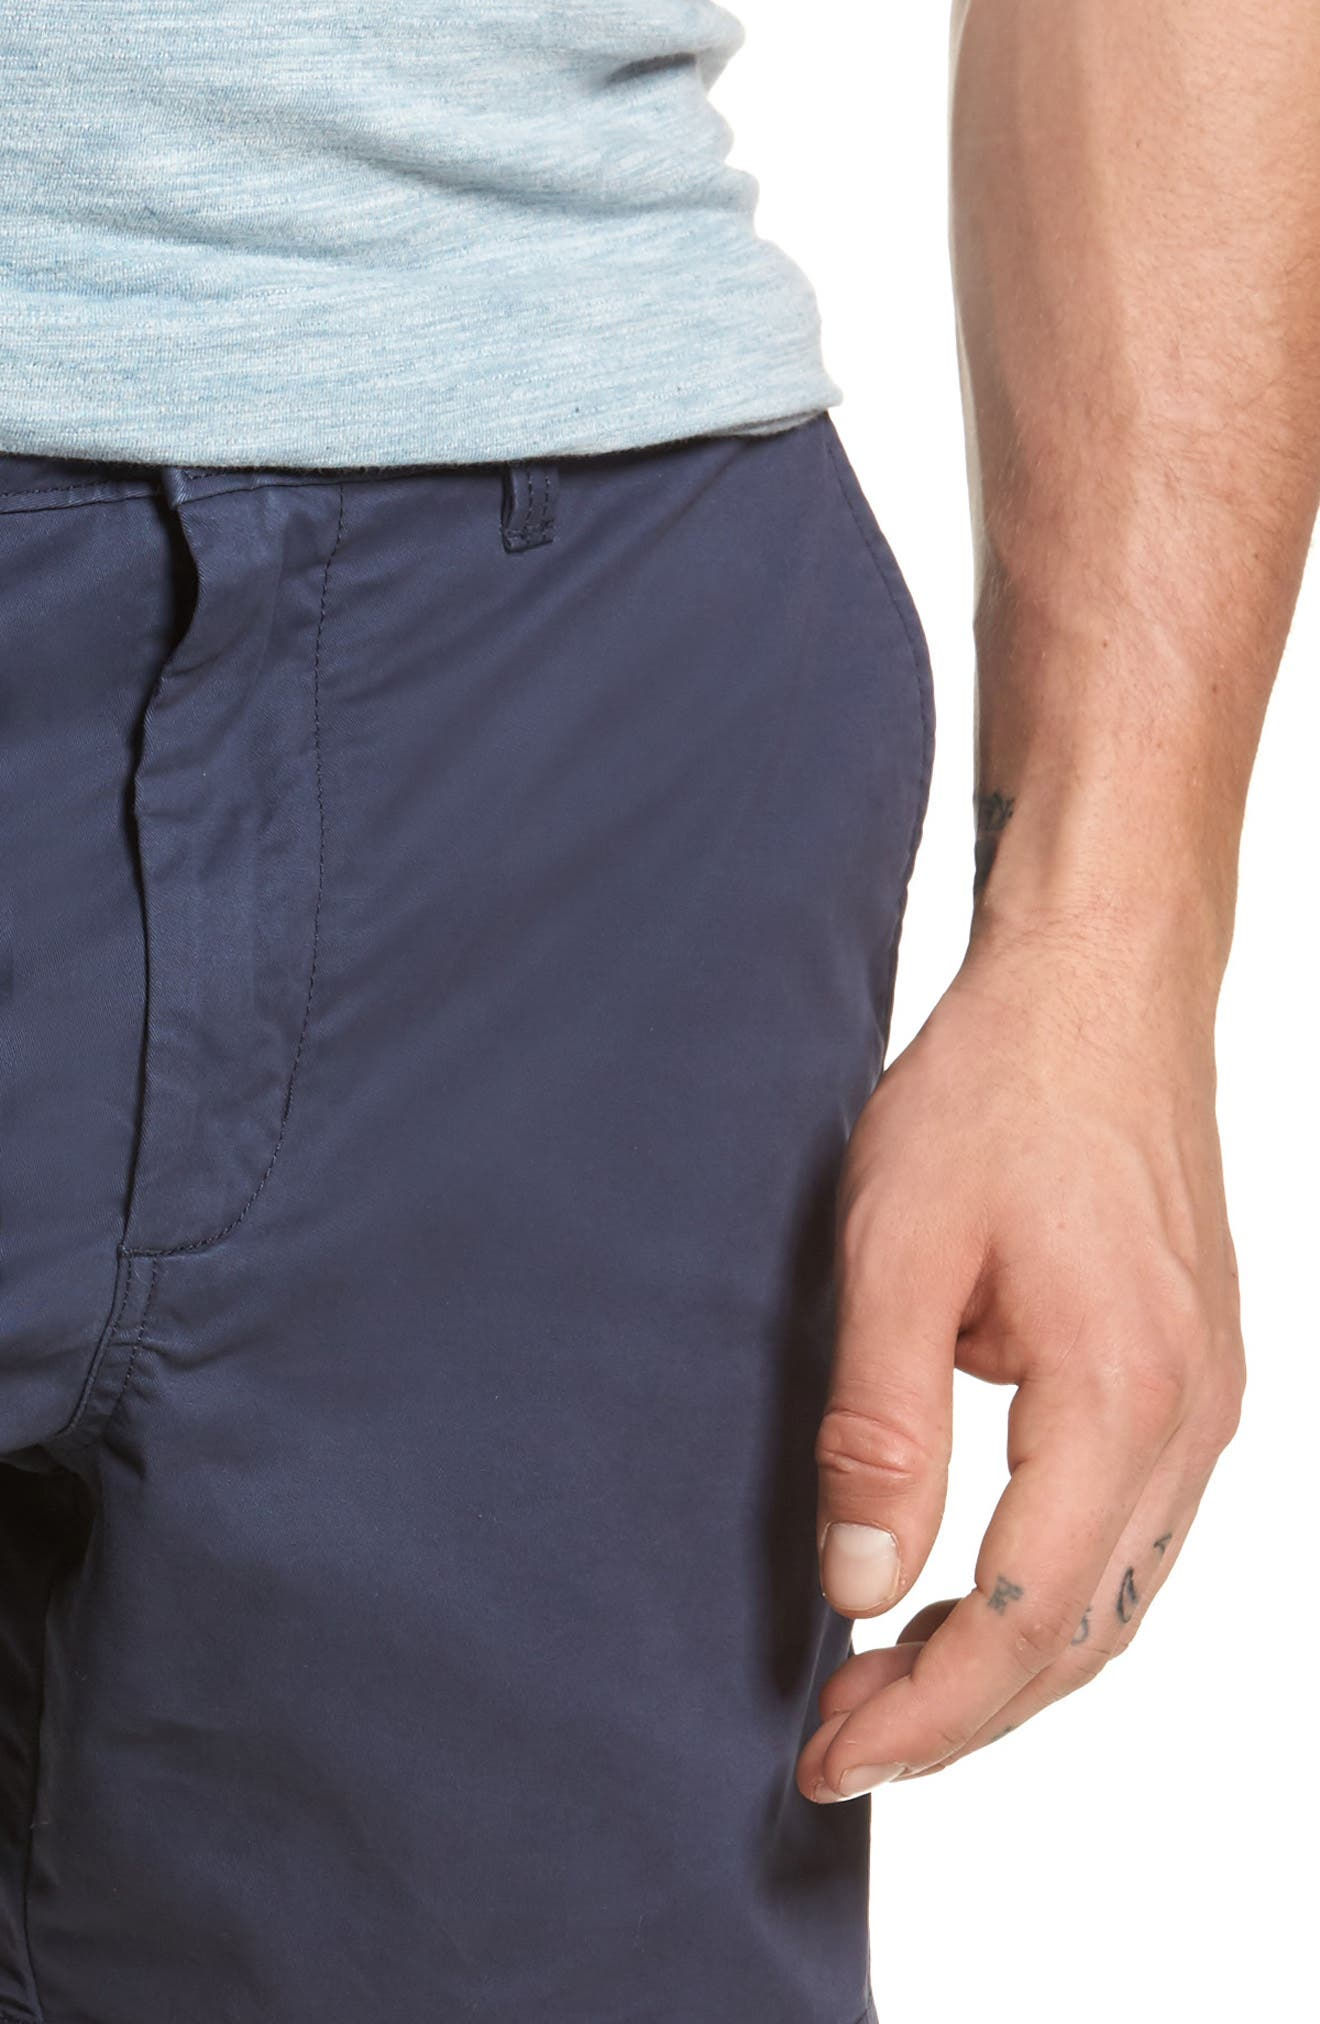 Ballard Slim Fit Stretch Chino 7-Inch Shorts,                             Alternate thumbnail 43, color,